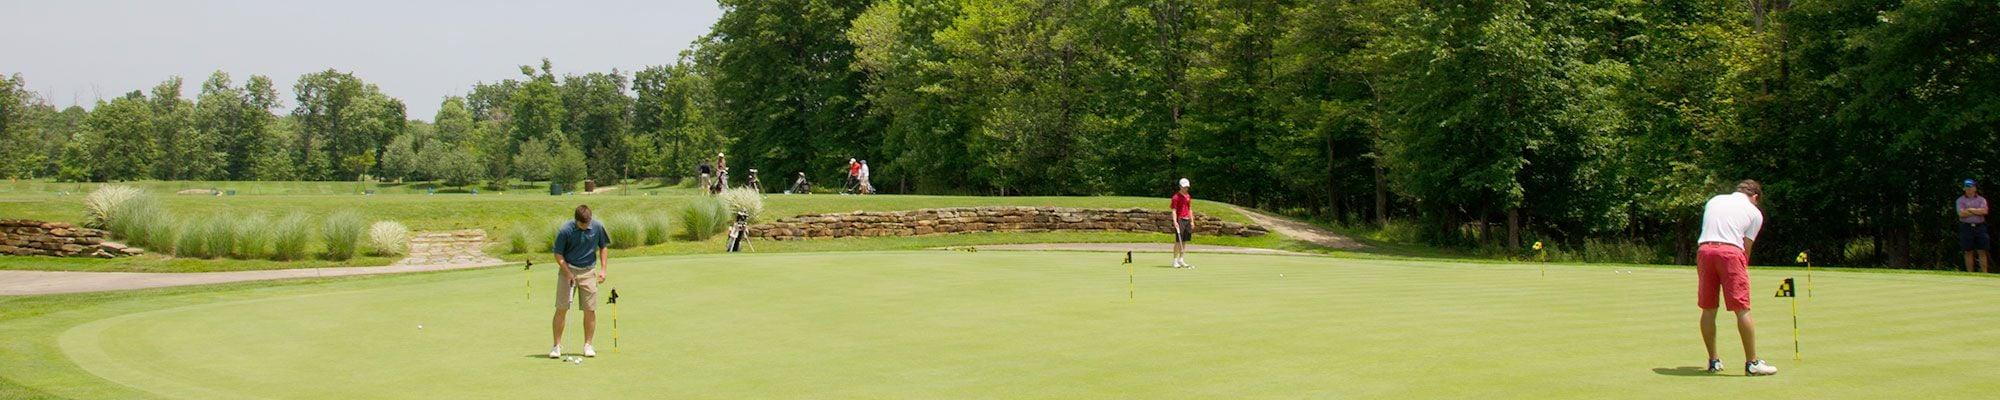 golf-club-memberships